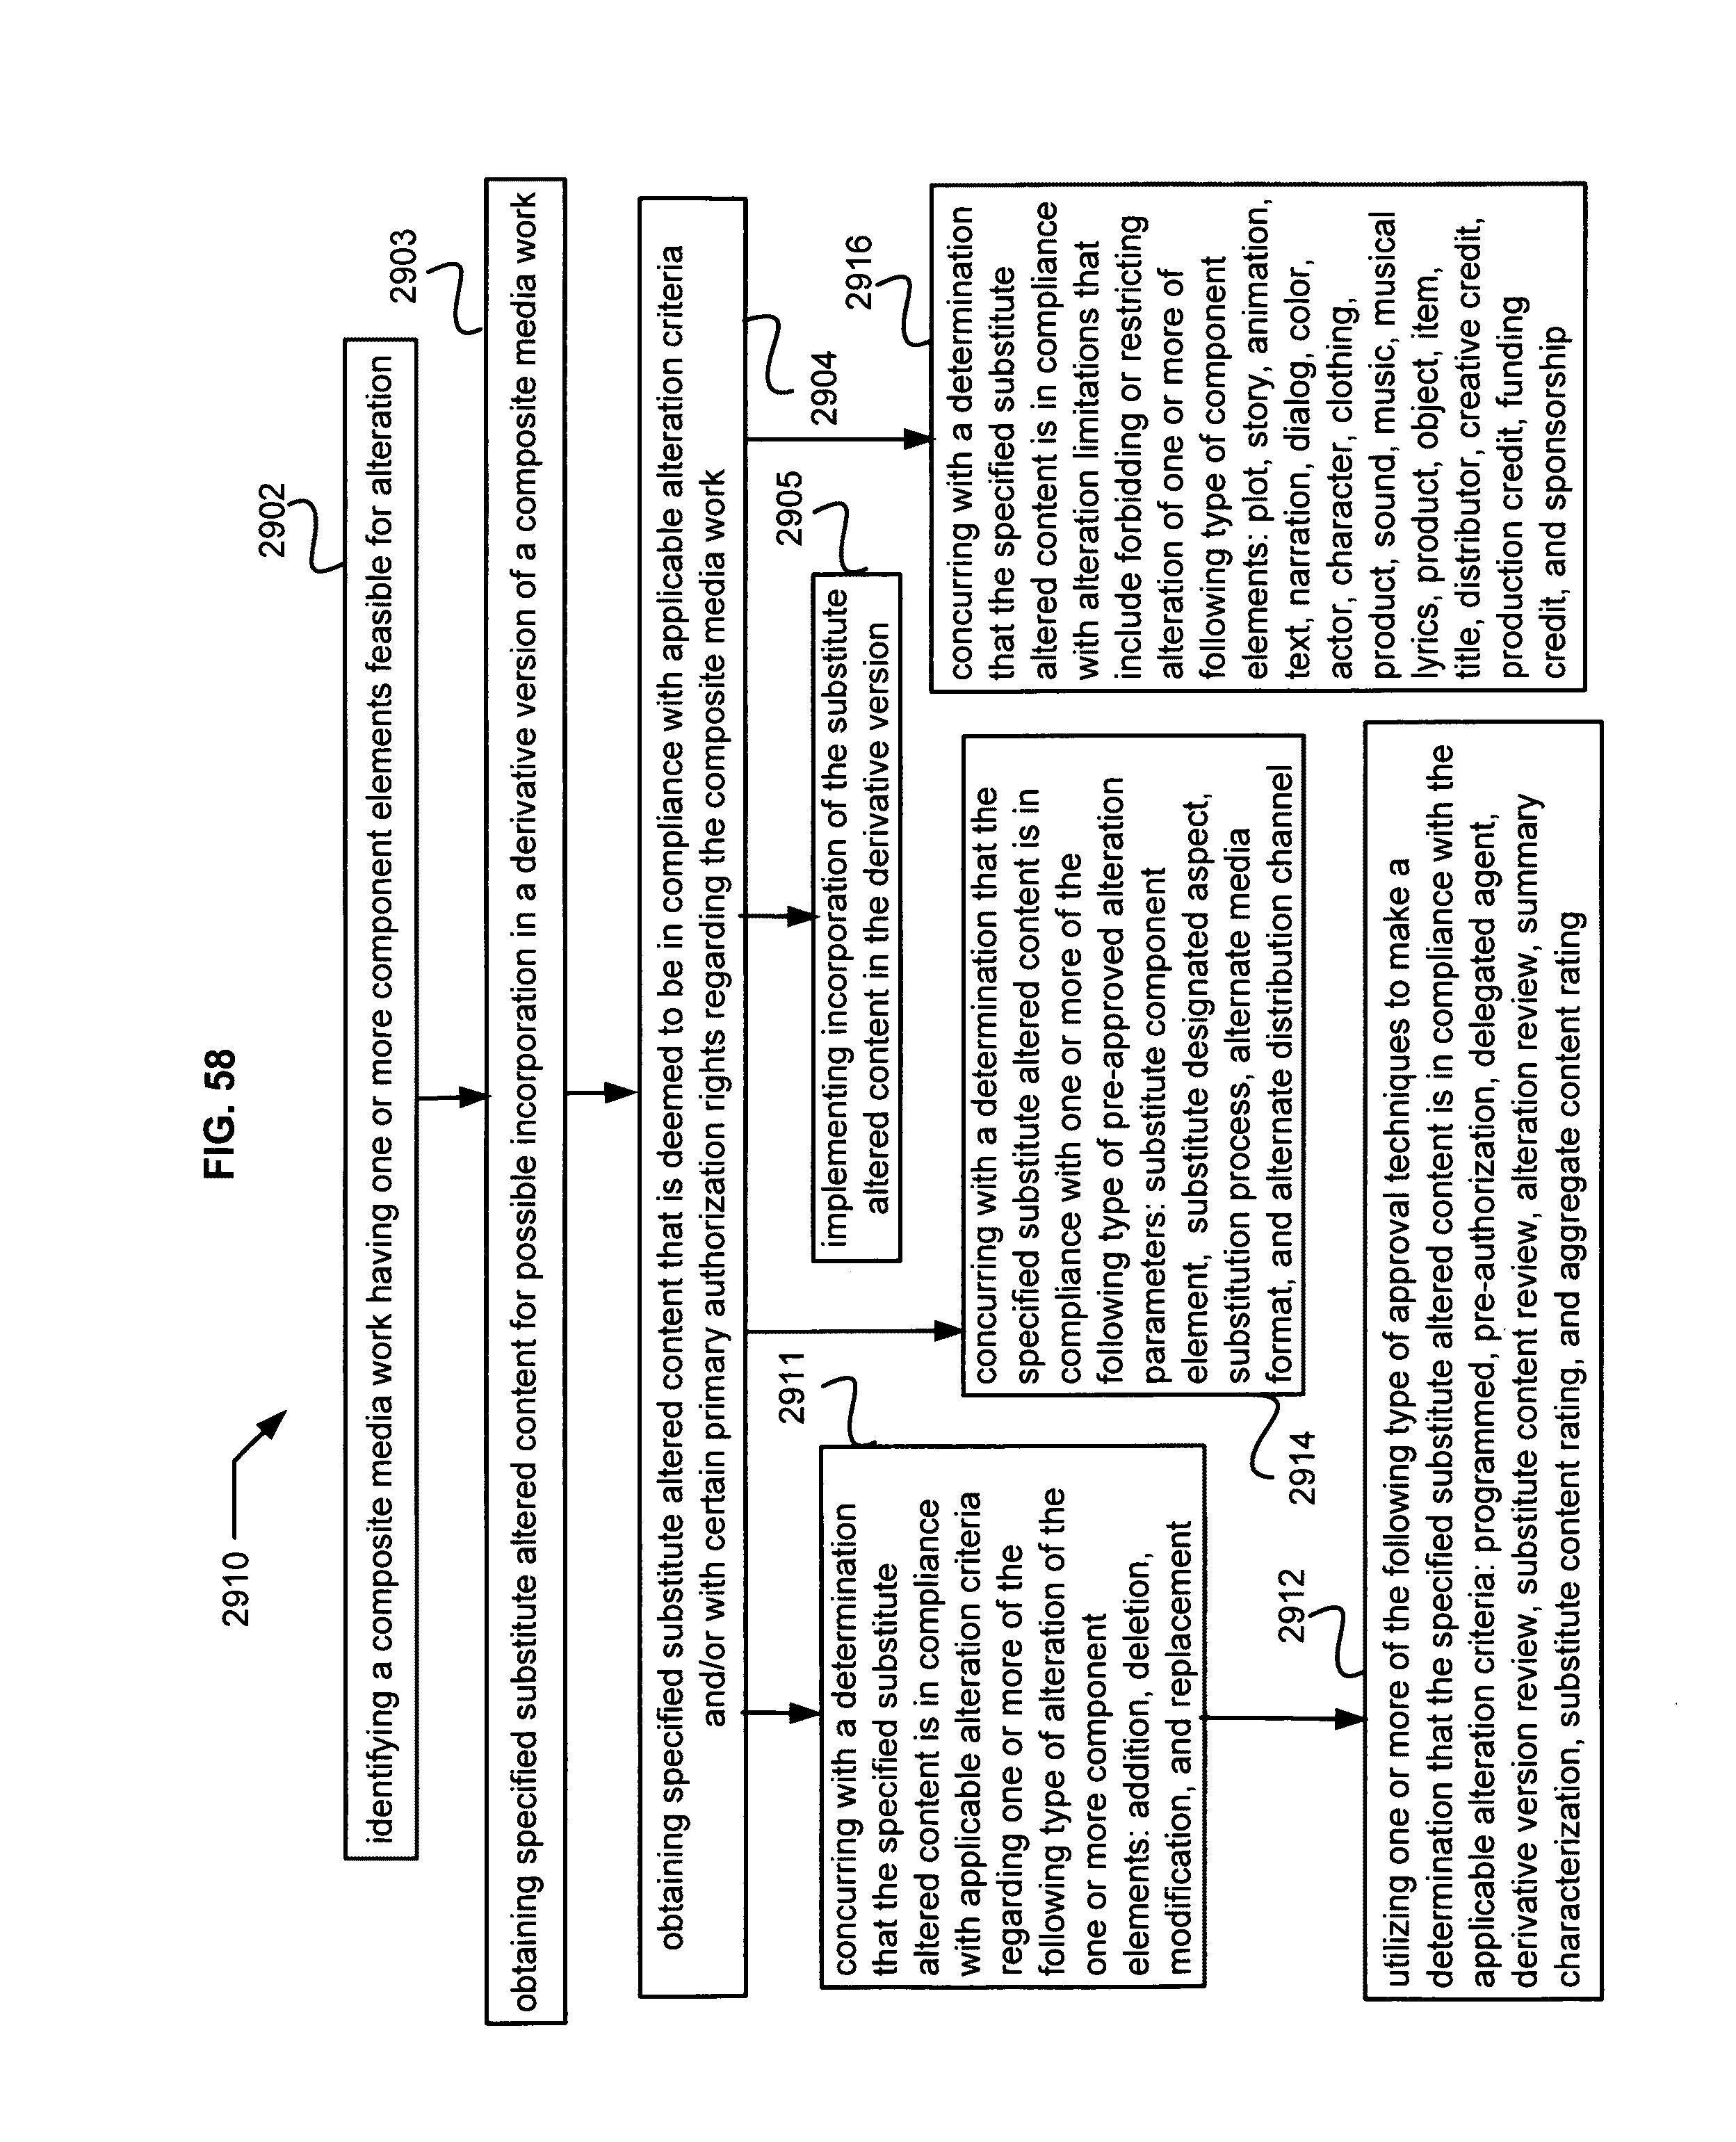 Patent US 9,583,141 B2